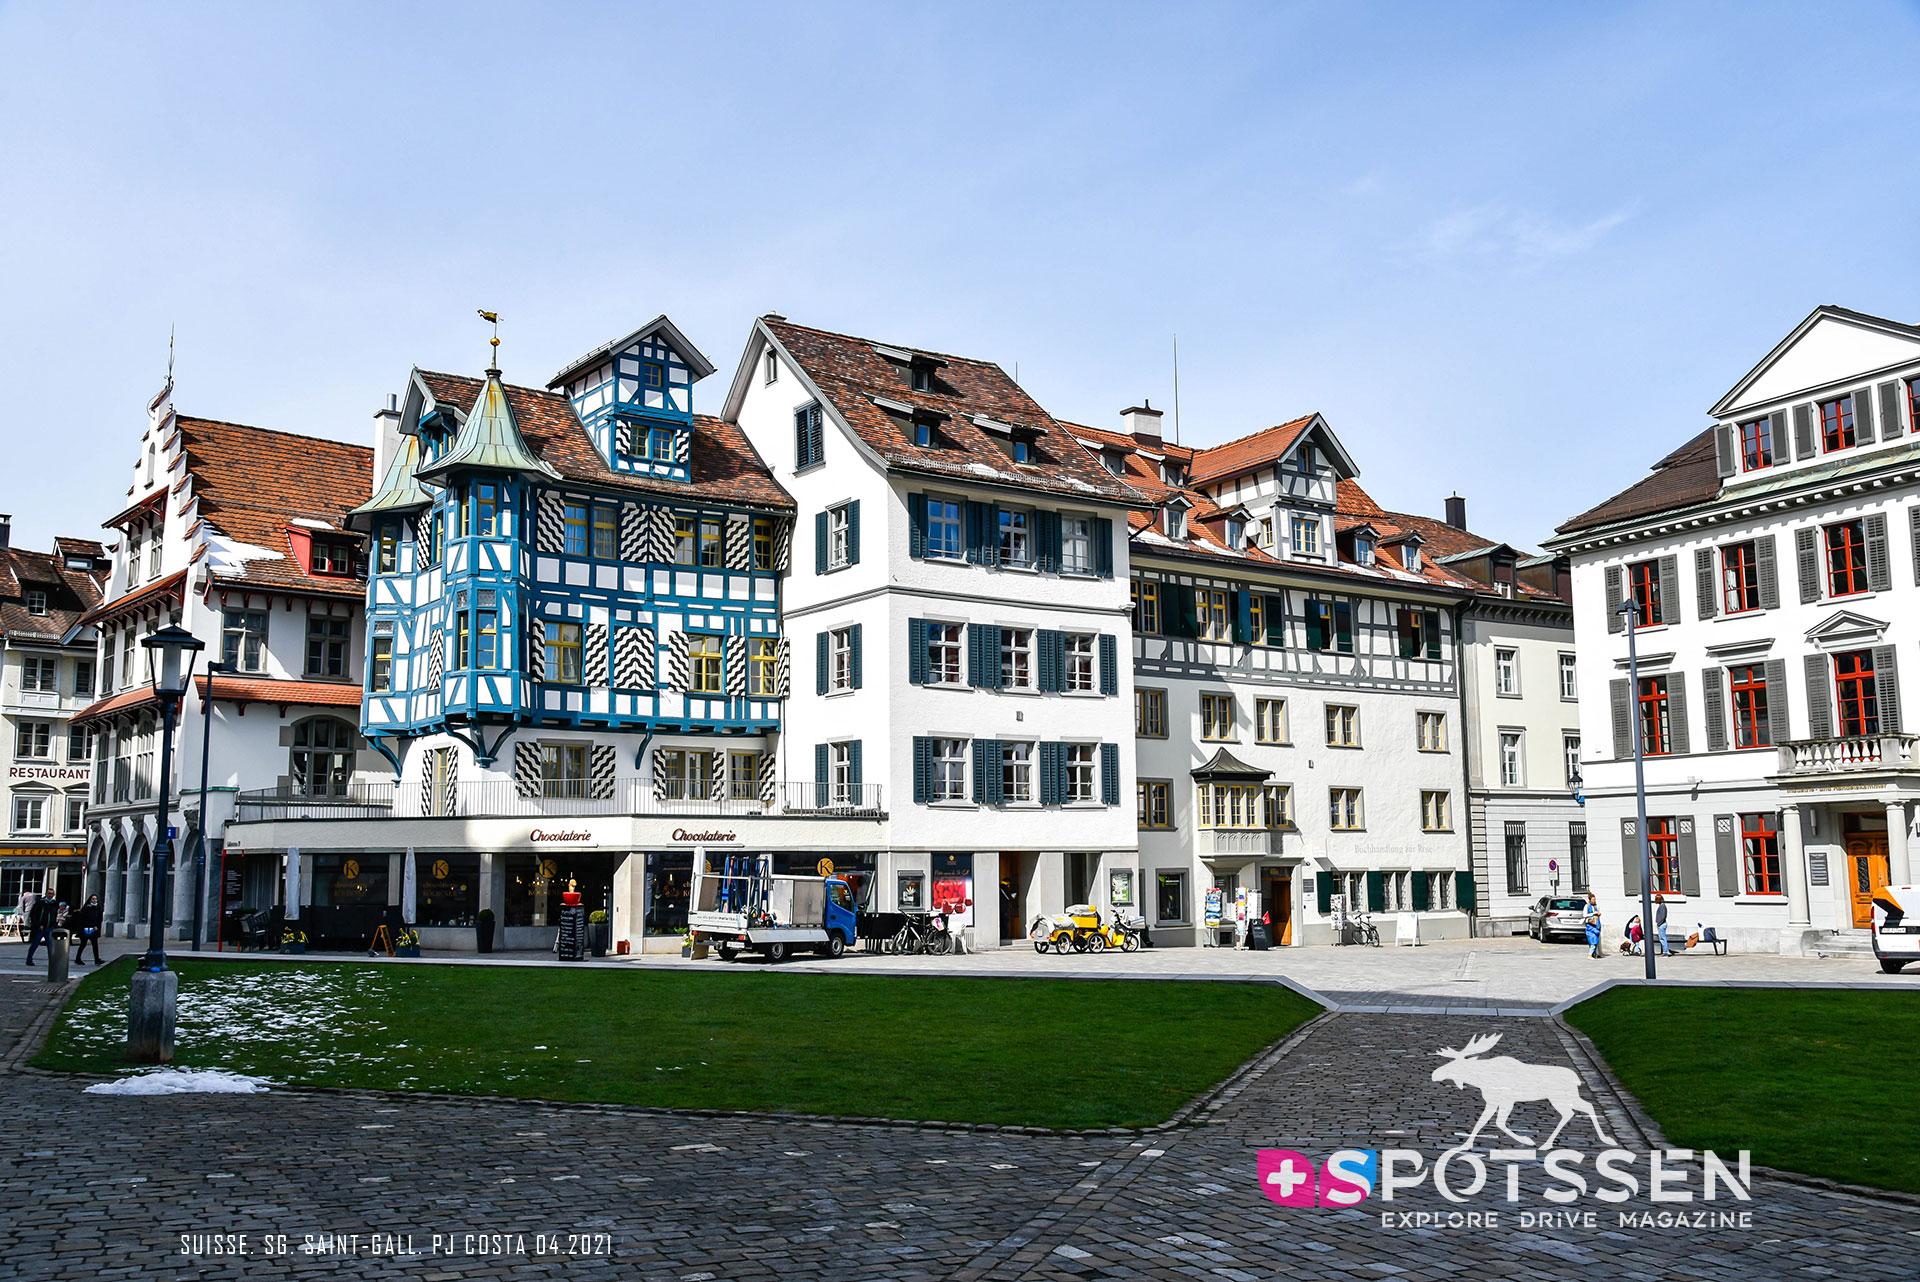 2021, saint-gall, suisse